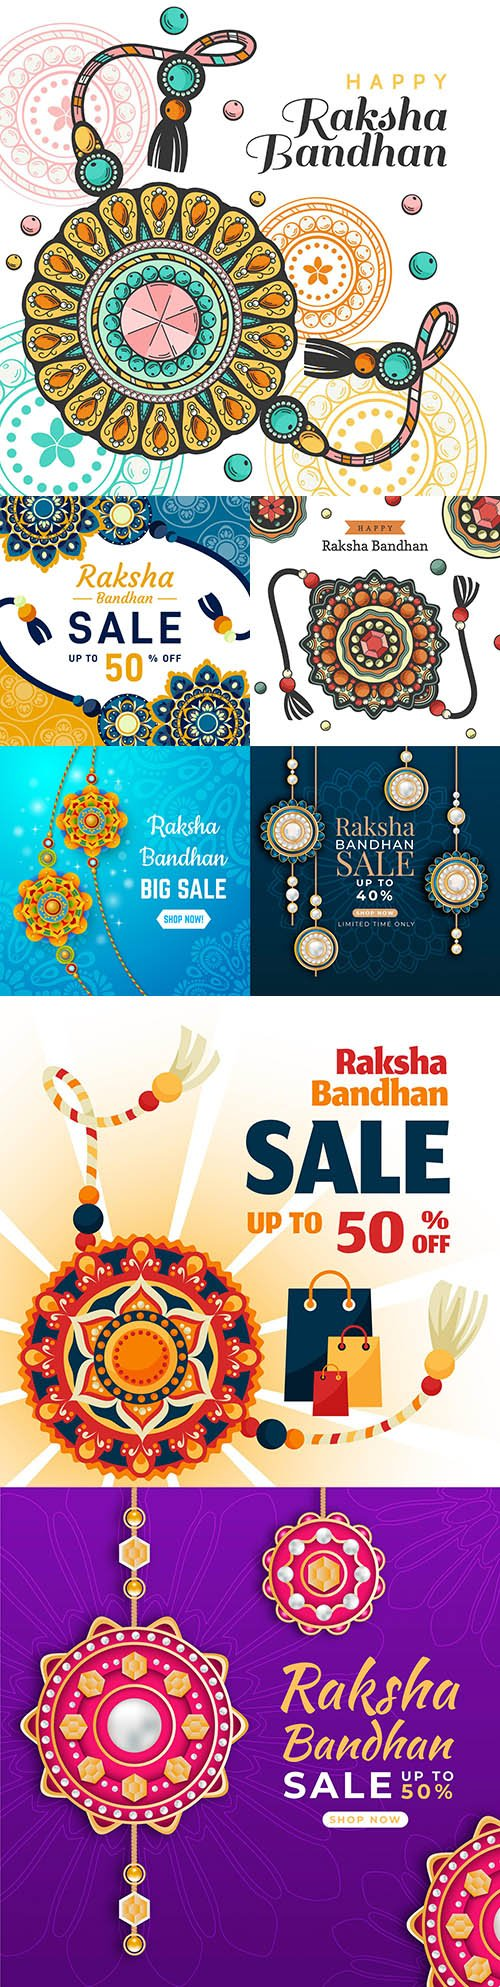 Raksha Bandhan Indian Holiday sale Flat Design Illustration